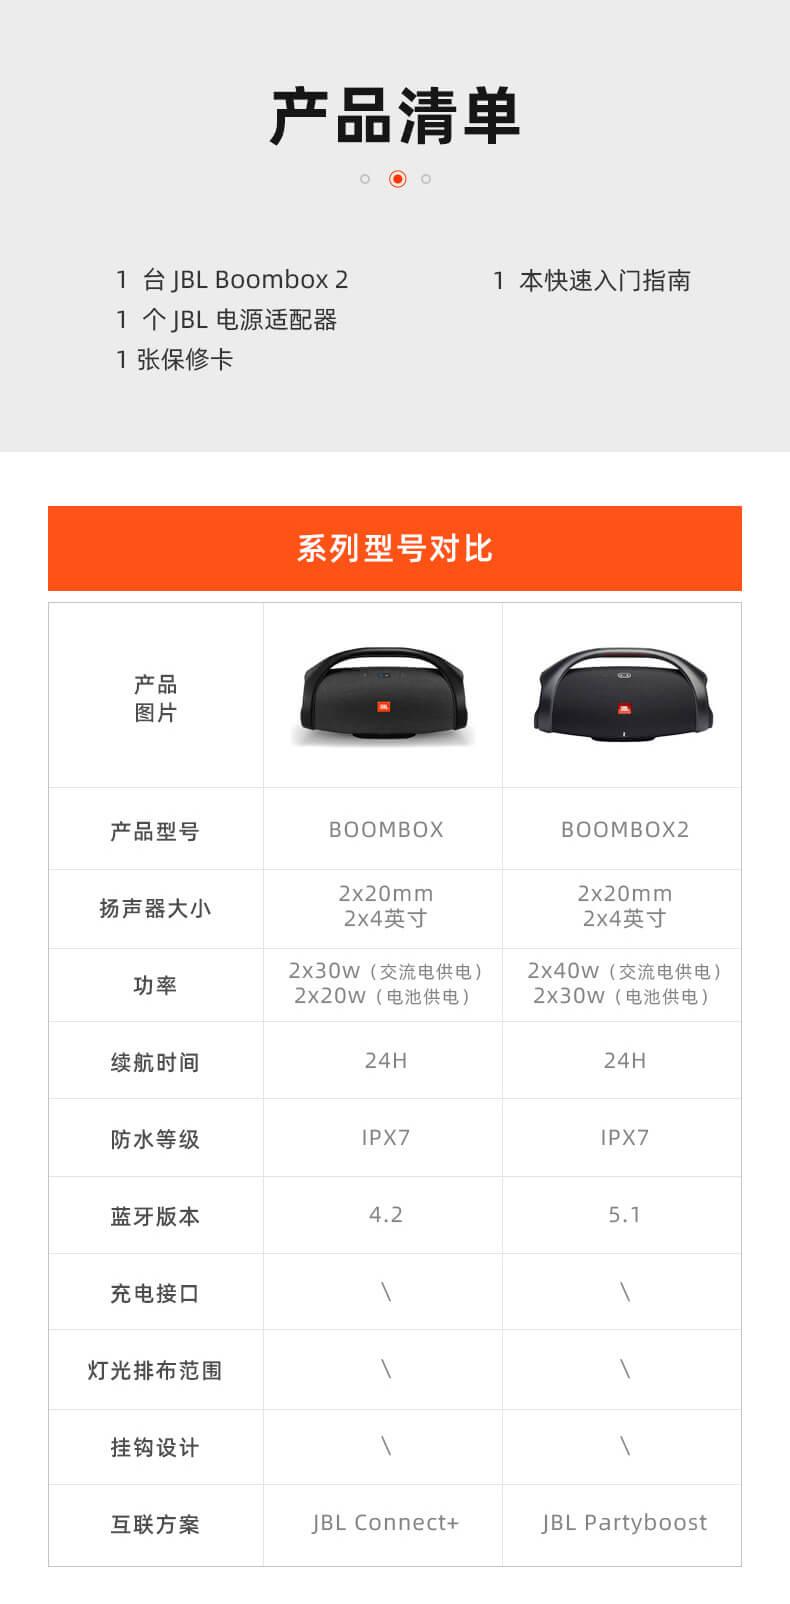 JBL BOOMBOX2音乐战神2代无线蓝牙音箱便携户外音响hifi低音增强